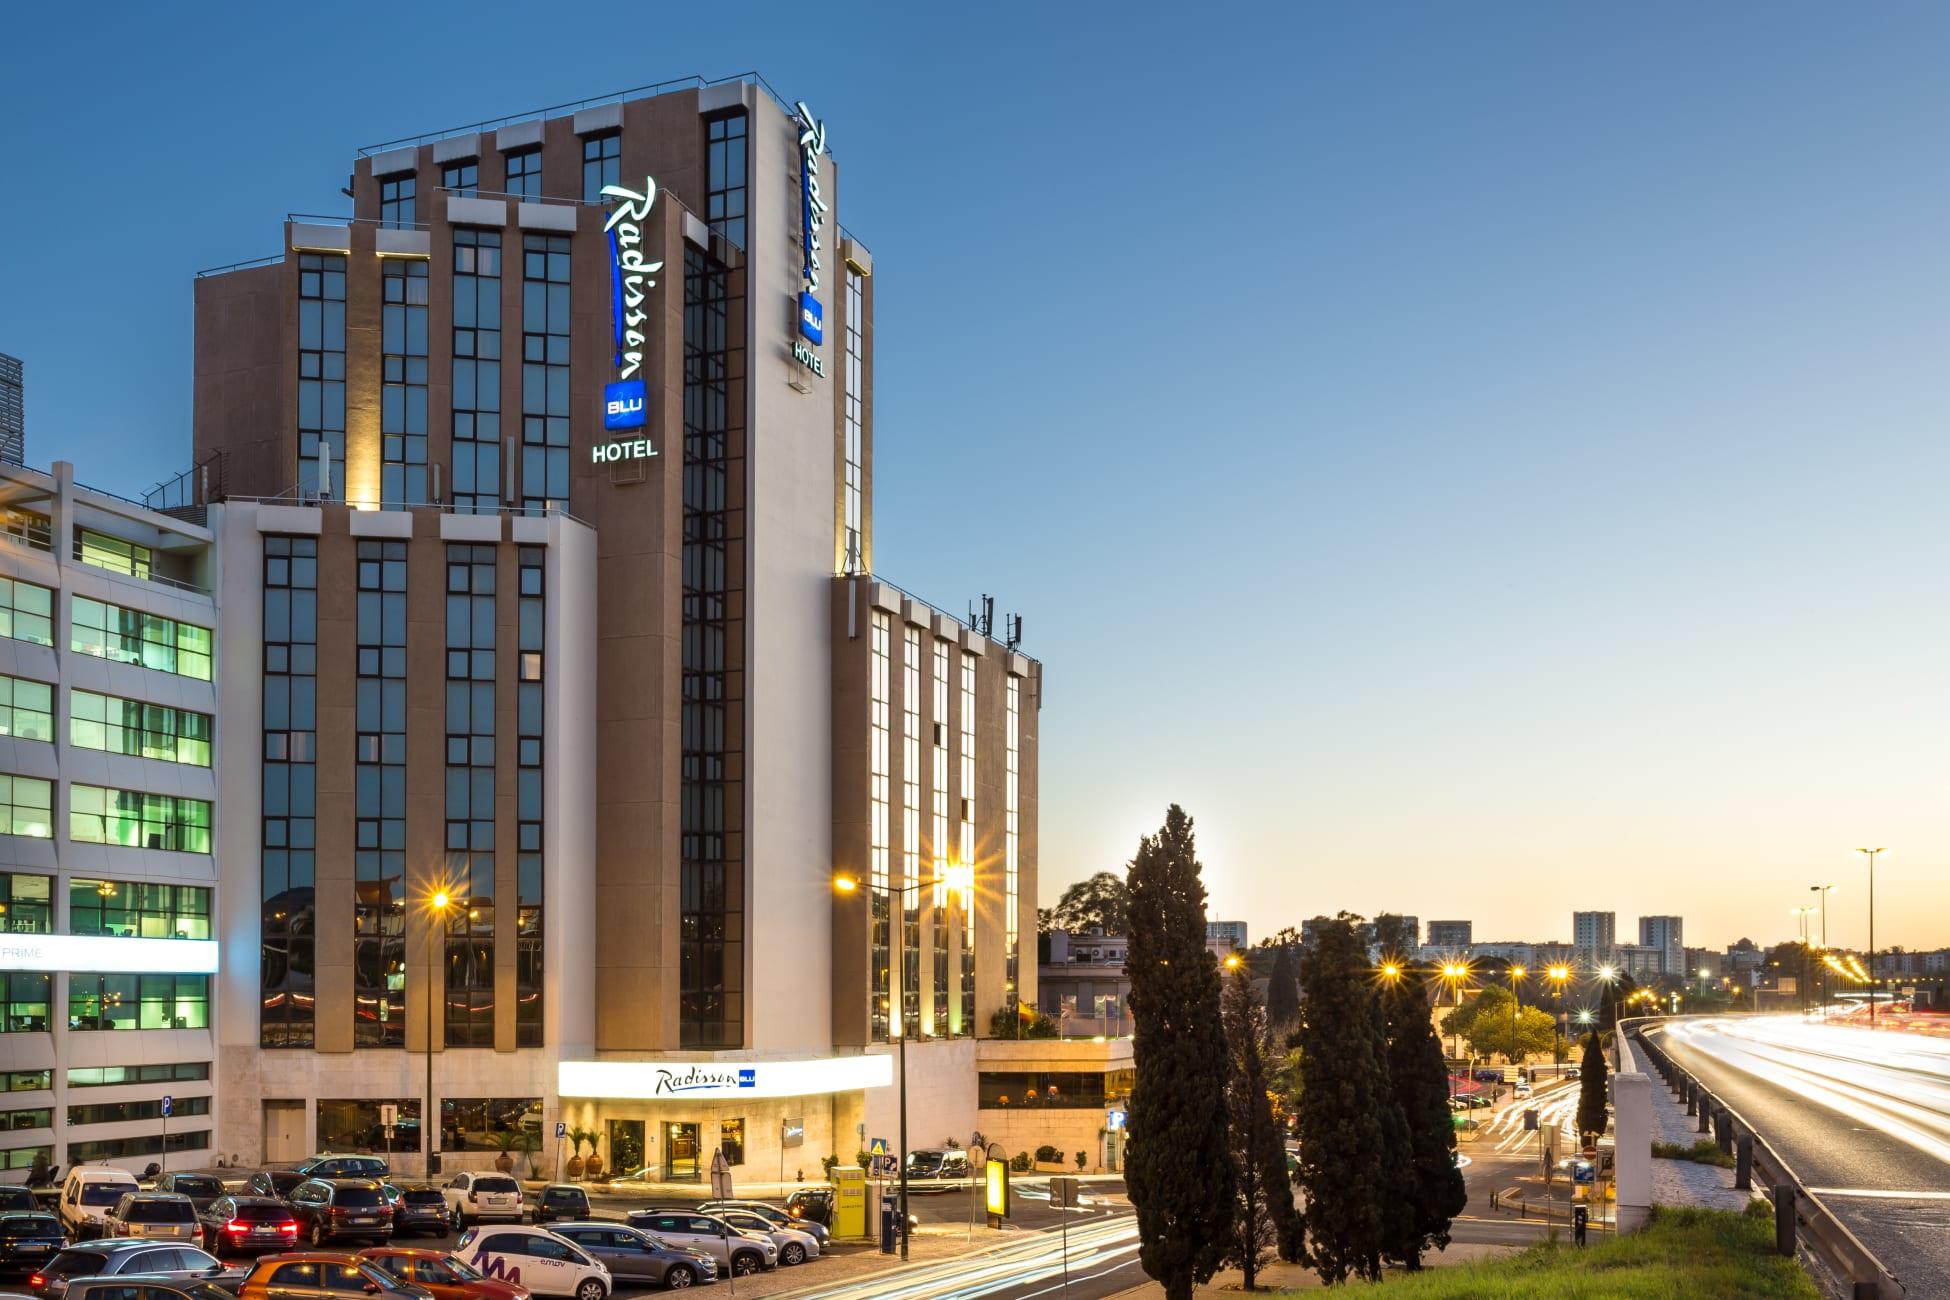 Hotel Di Lisbon Radisson Blu Hotel Lisbon Trivago Co Id